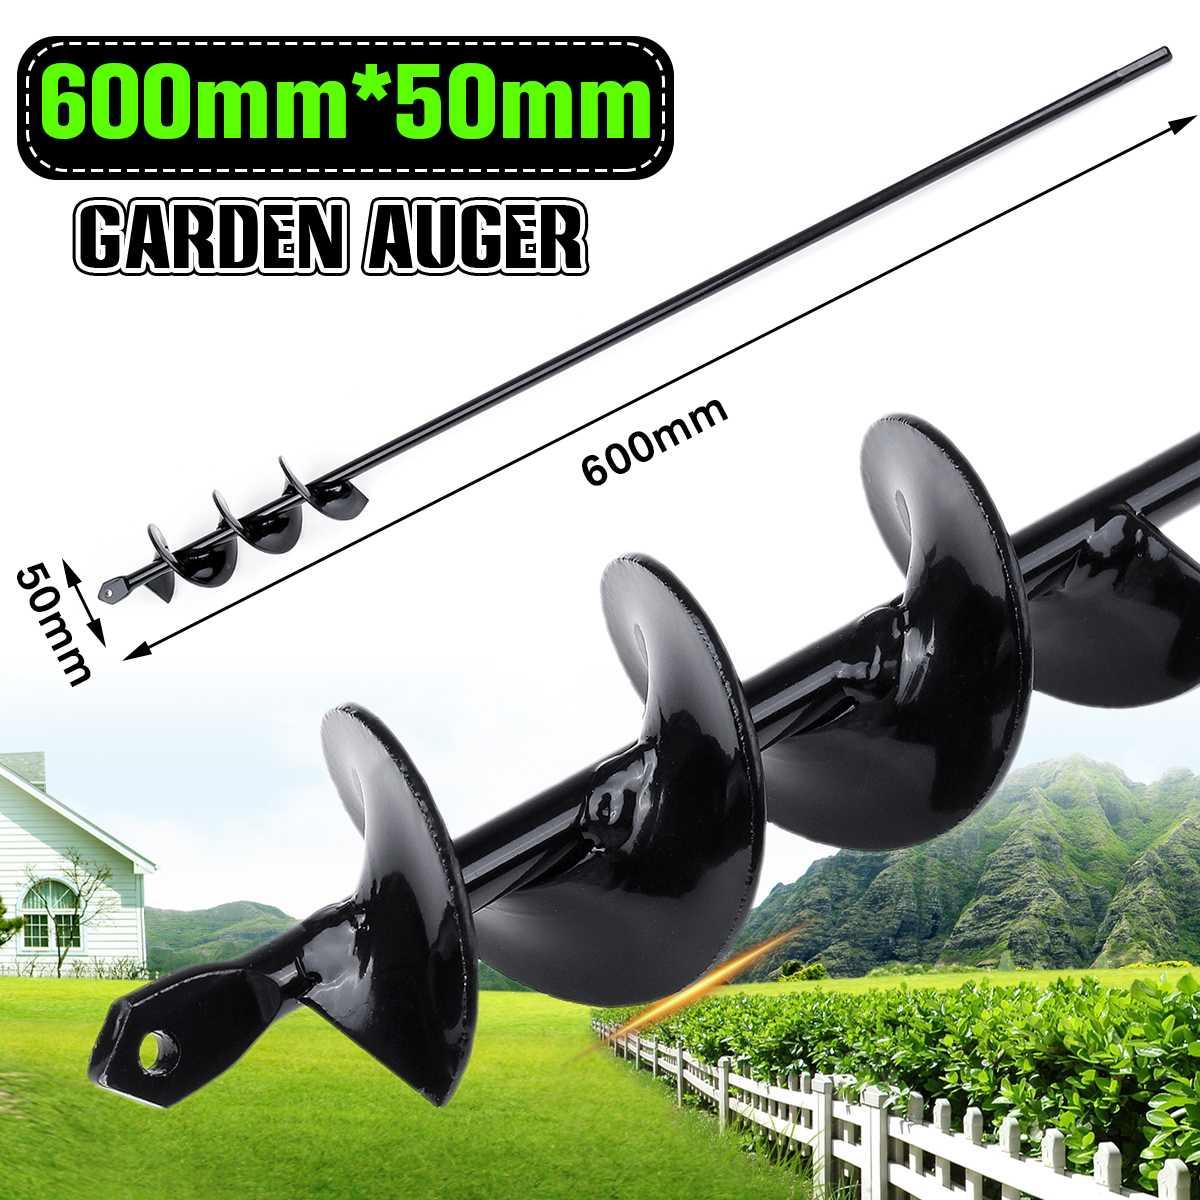 1pcs-earth-auger-hole-digger-600x50mm-tool-garden-planting-machine-drill-bit-borer-post-hole-digger-garden-auger-tool